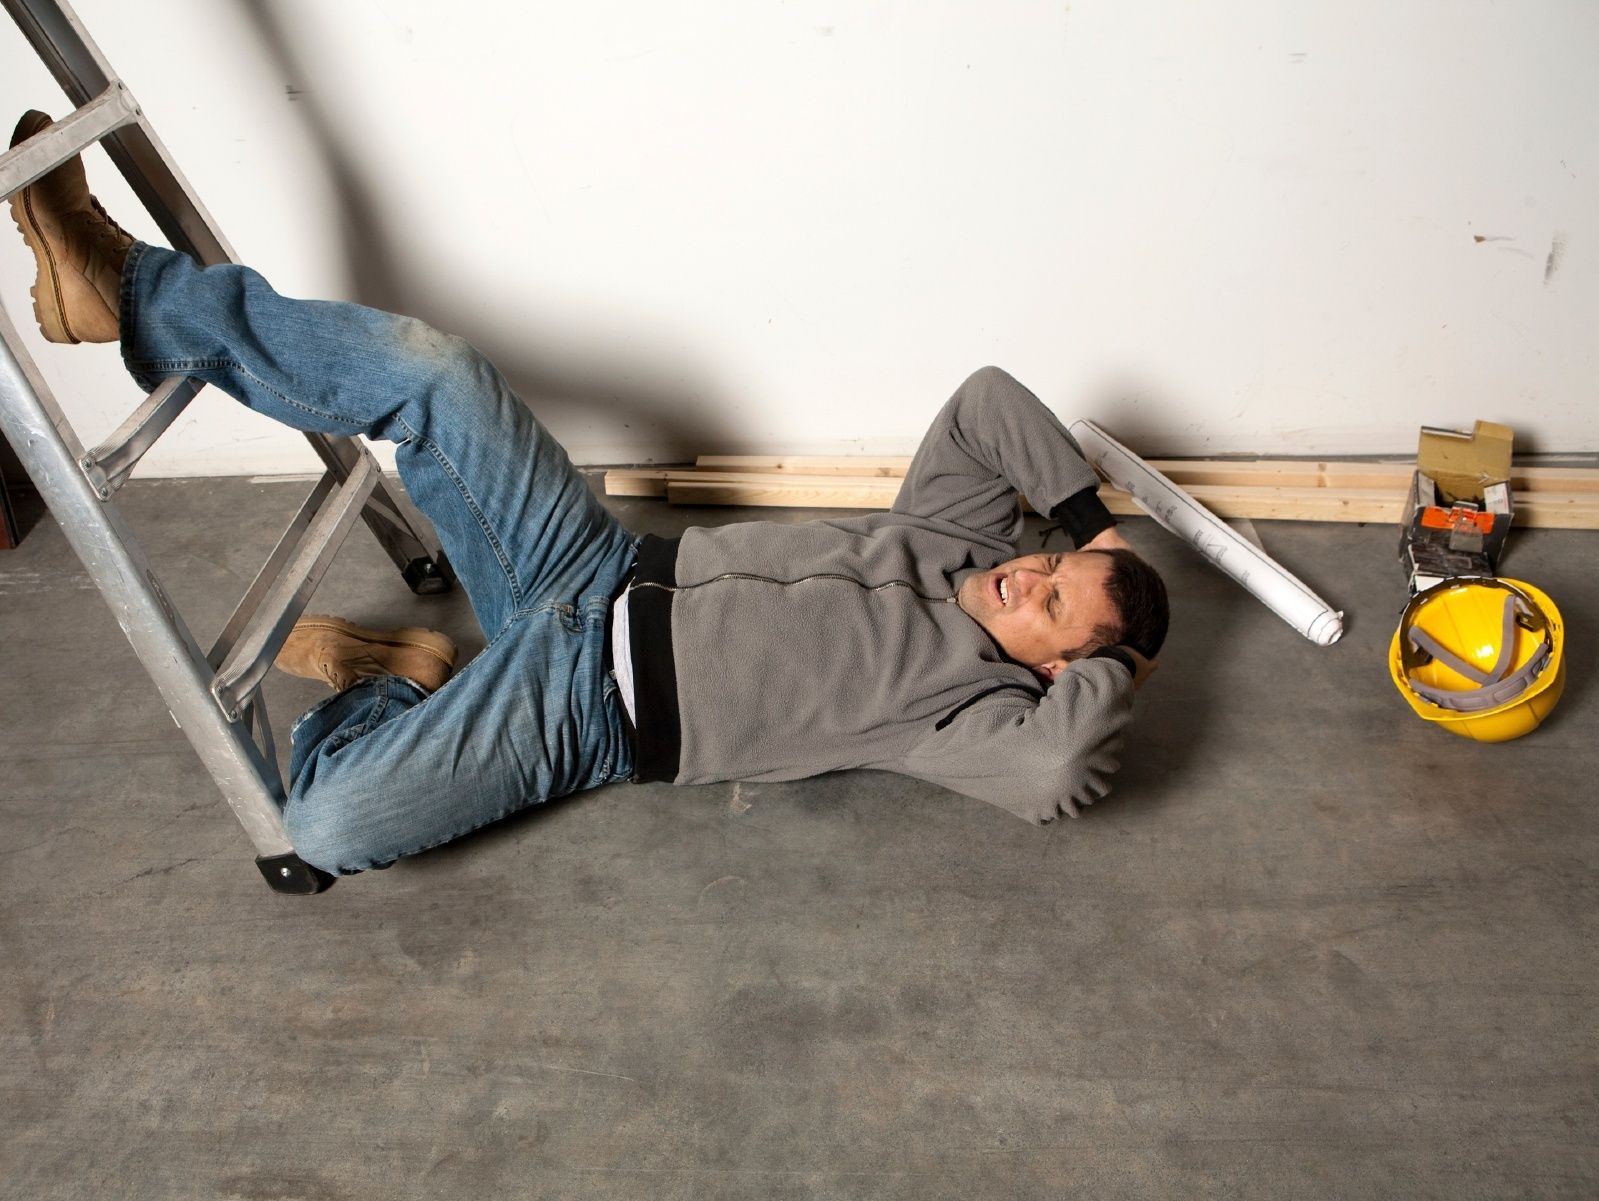 Injured at Work | Atlanta Chiropractic Treatment